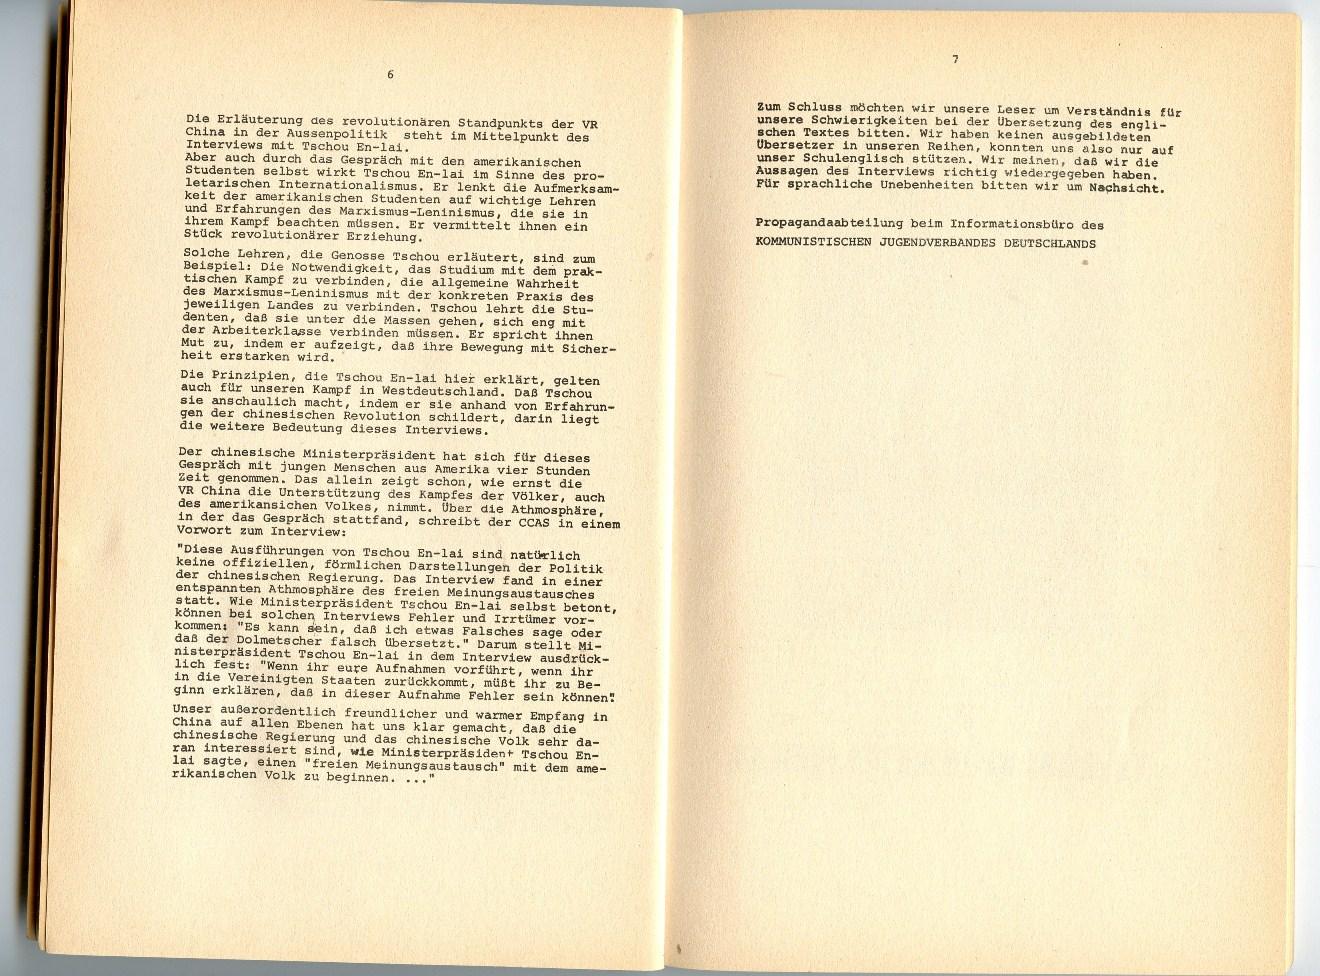 ZB_VRChina_Bollwerk_1971_05